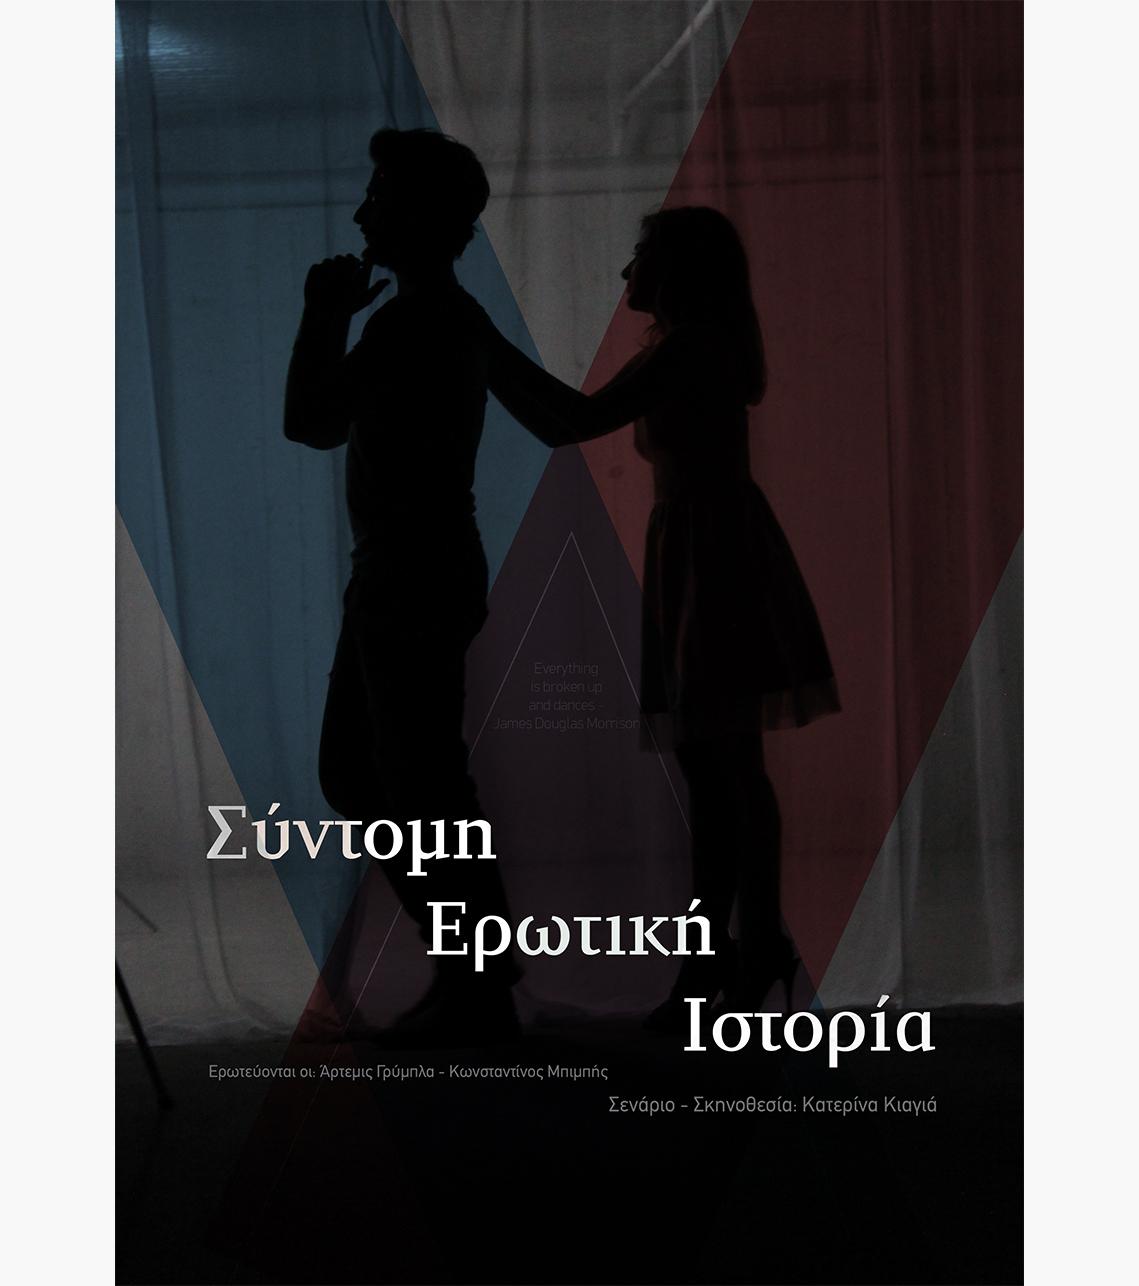 https://panoponti.com/wp-content/uploads/2016/09/syntomo-poster5α.jpg